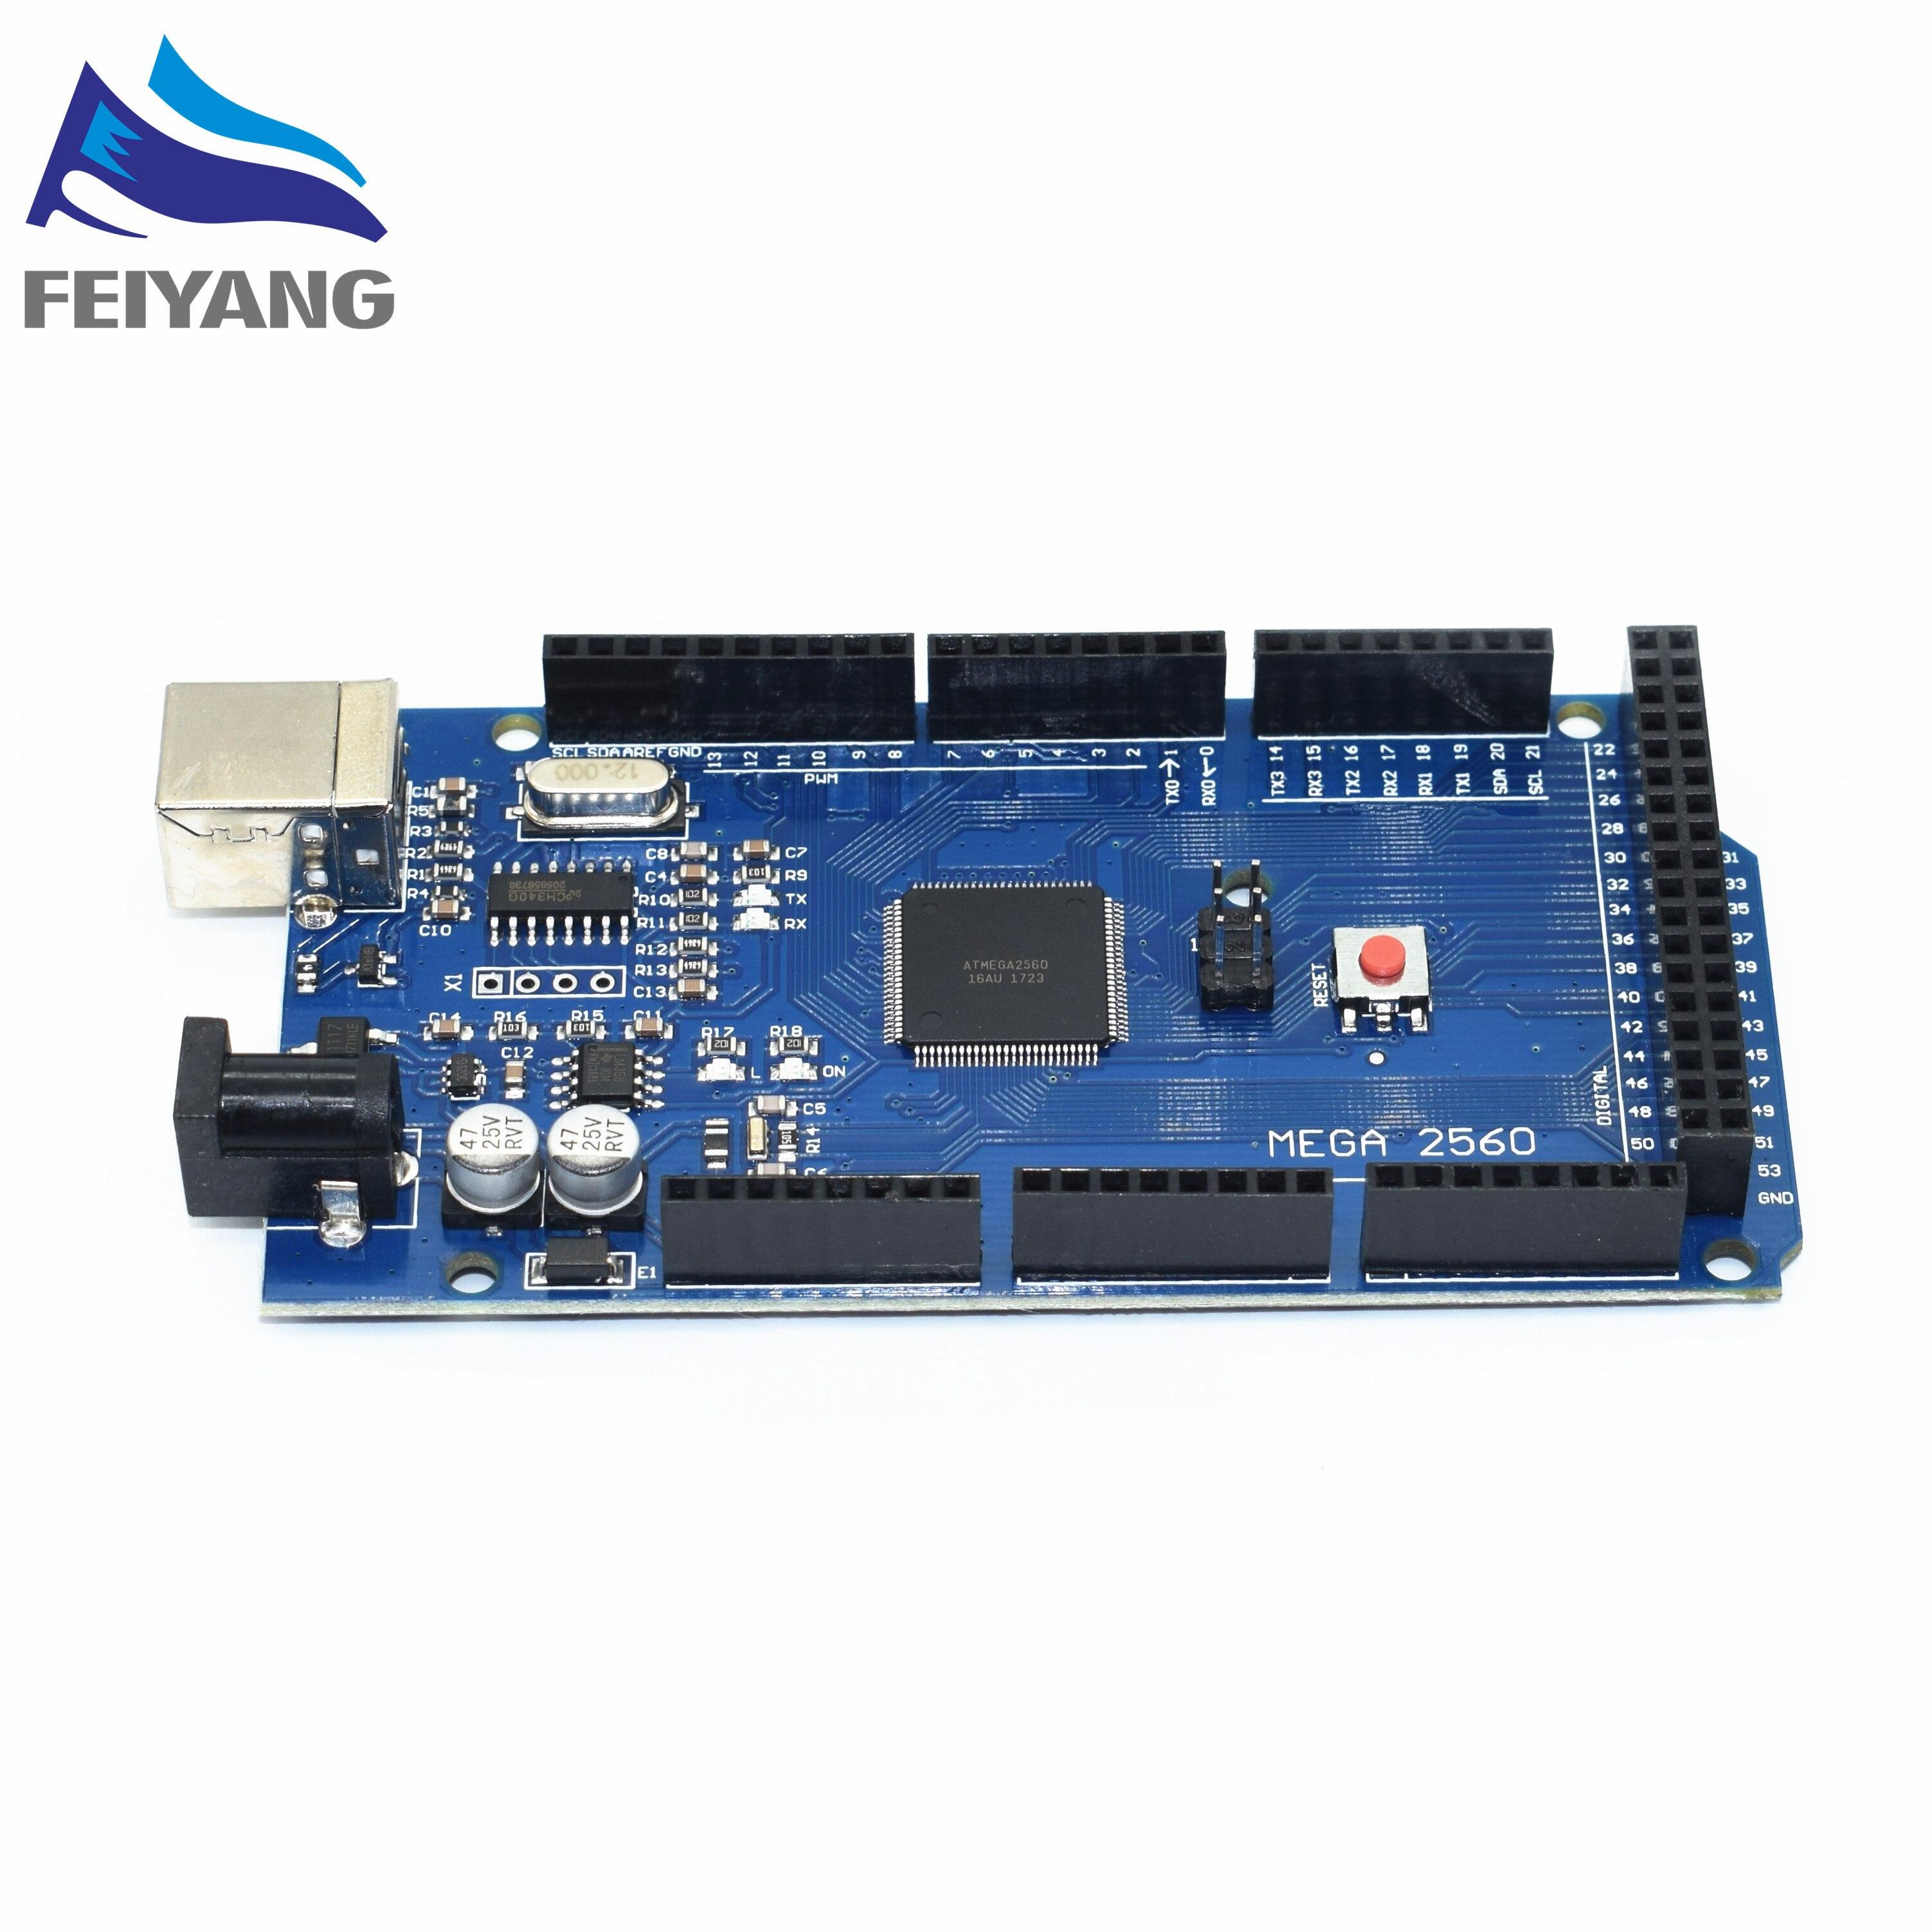 mega2560-mega-2560-r3-atmega2560-16au-ch340g-avr-usb-board-for-font-b-arduino-b-font